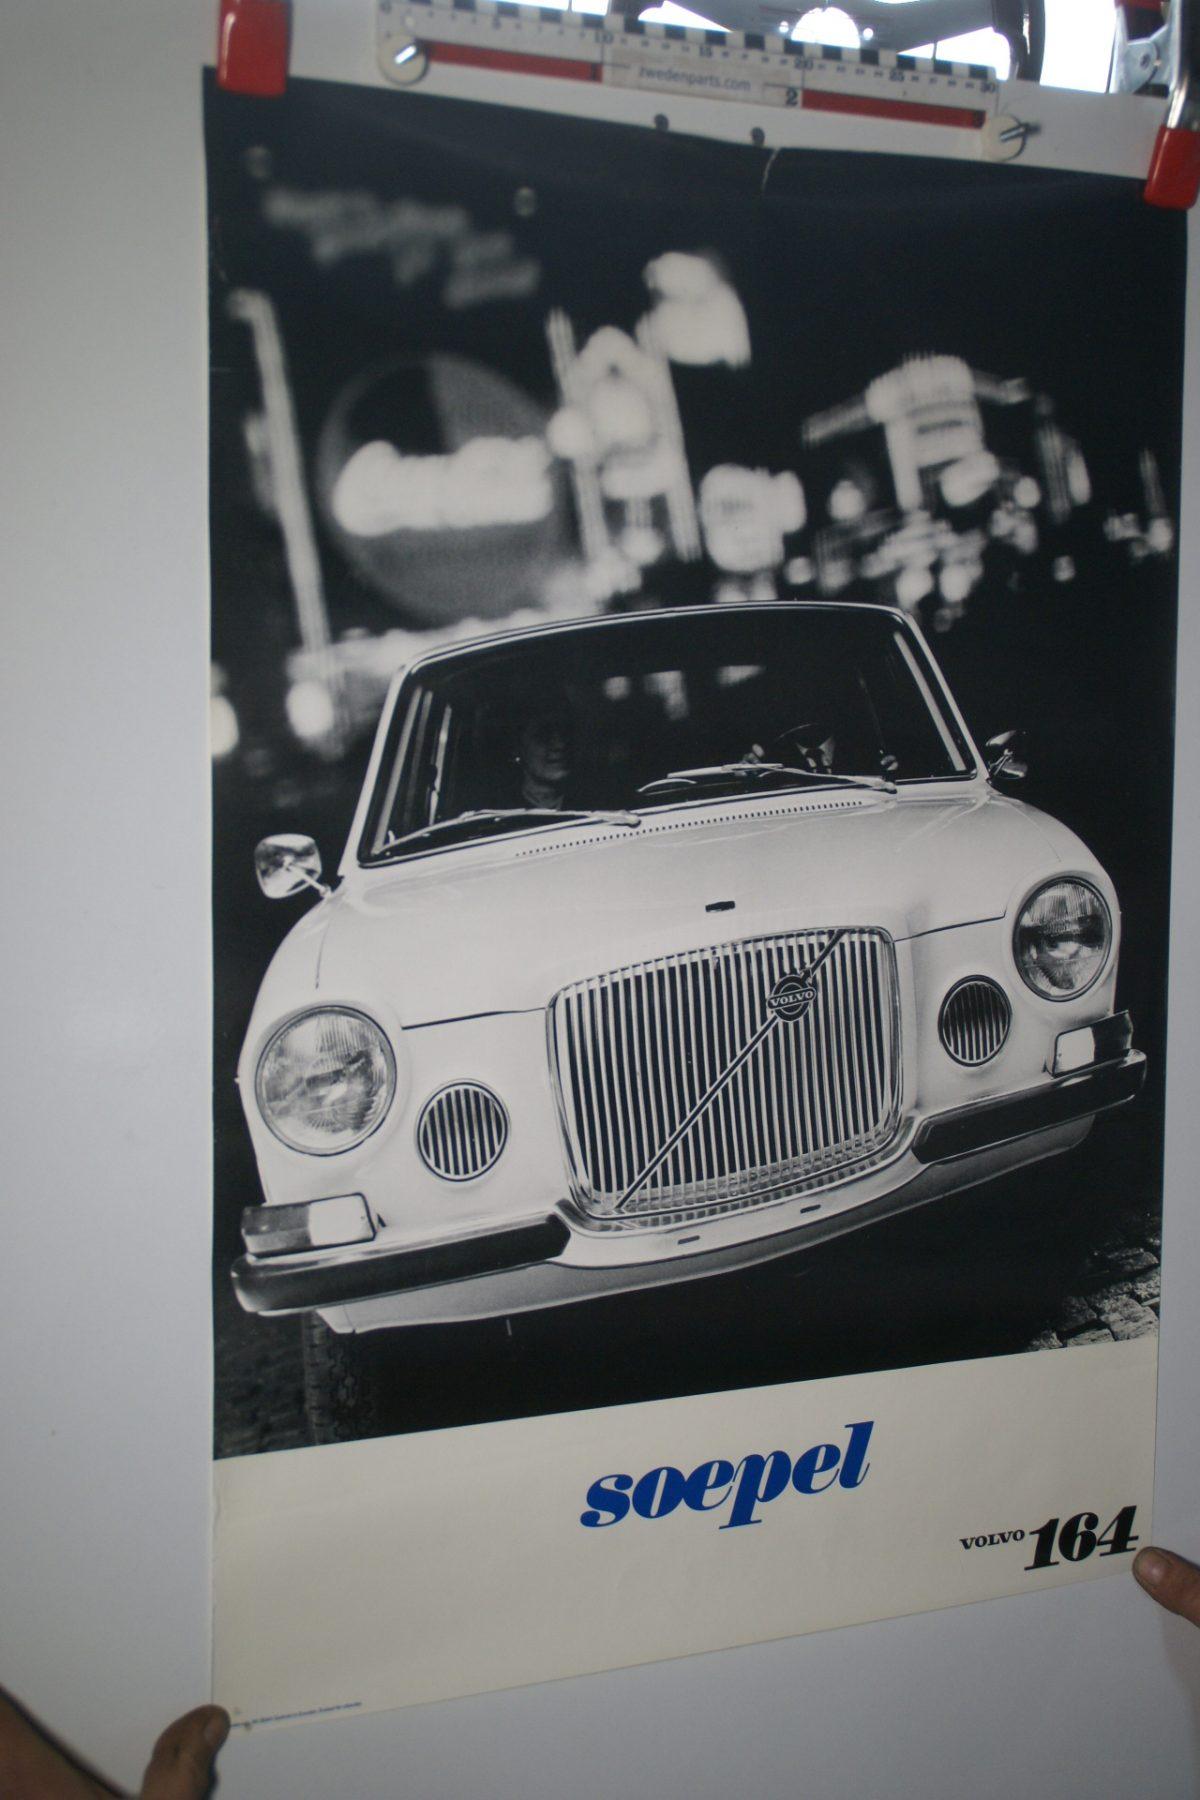 DSC02233 Volvo 164 wit poster 3644